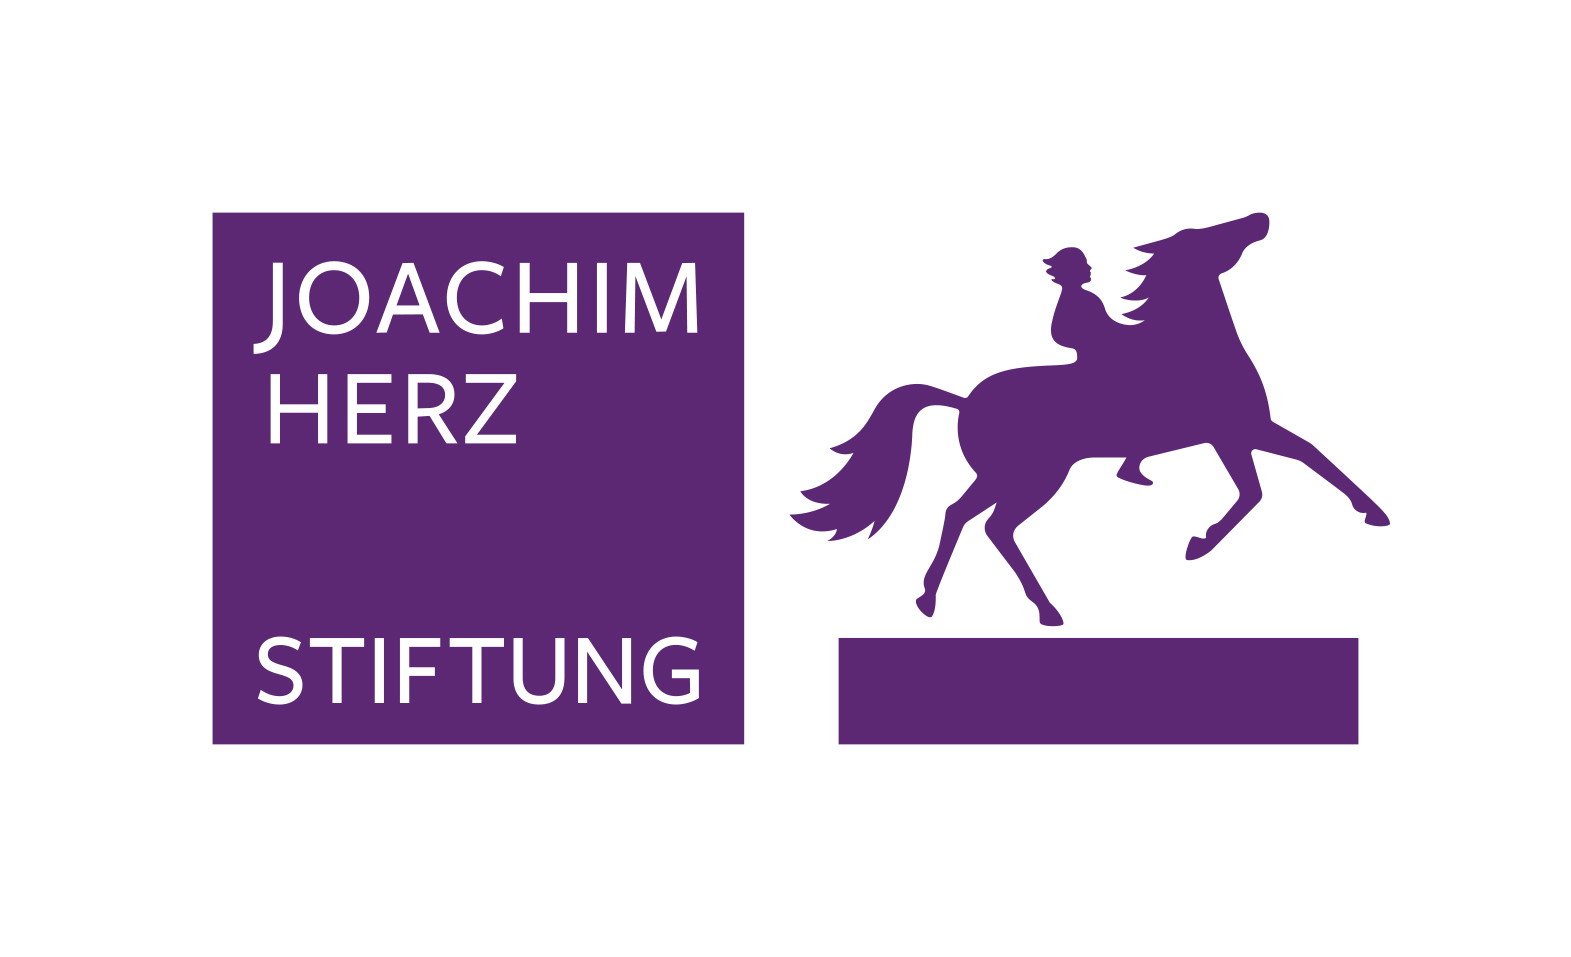 Logo Joachim Herz Stiftung